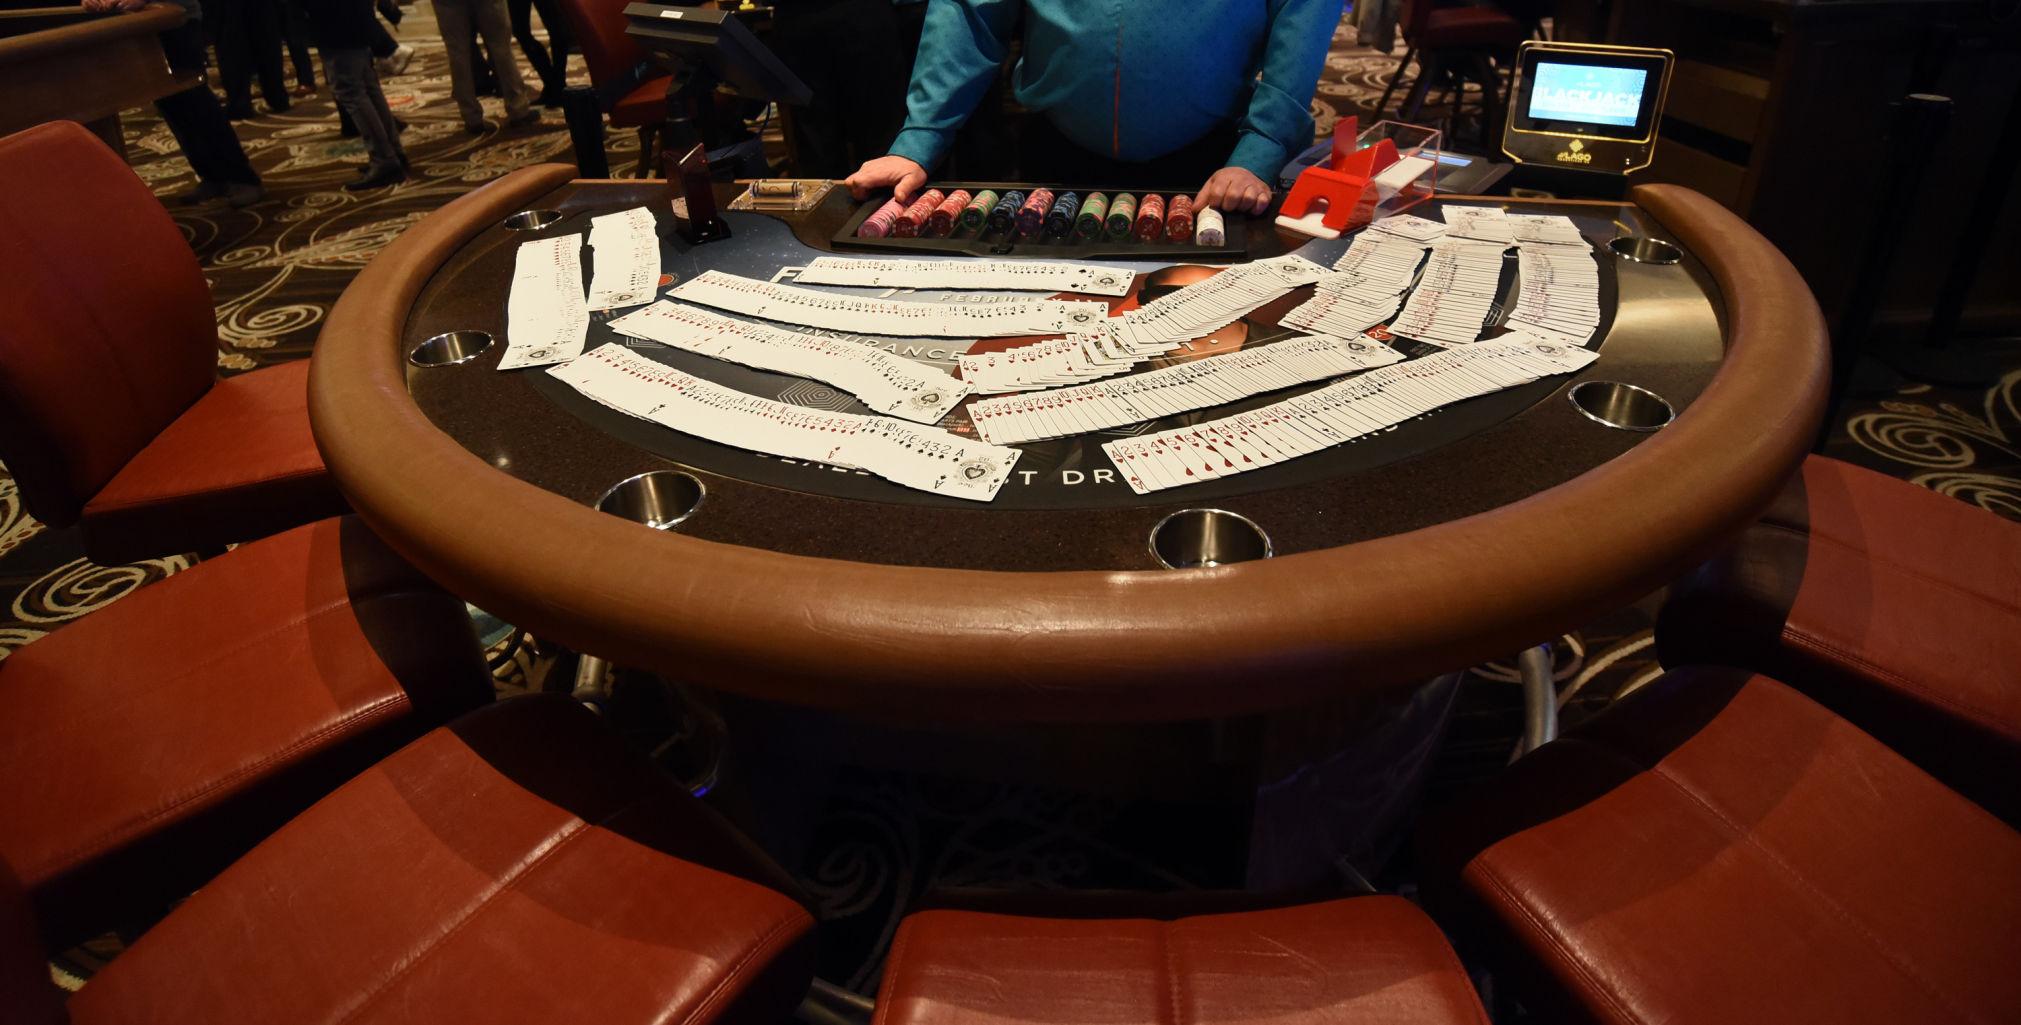 New york wineries casino casino royale by ian fleming